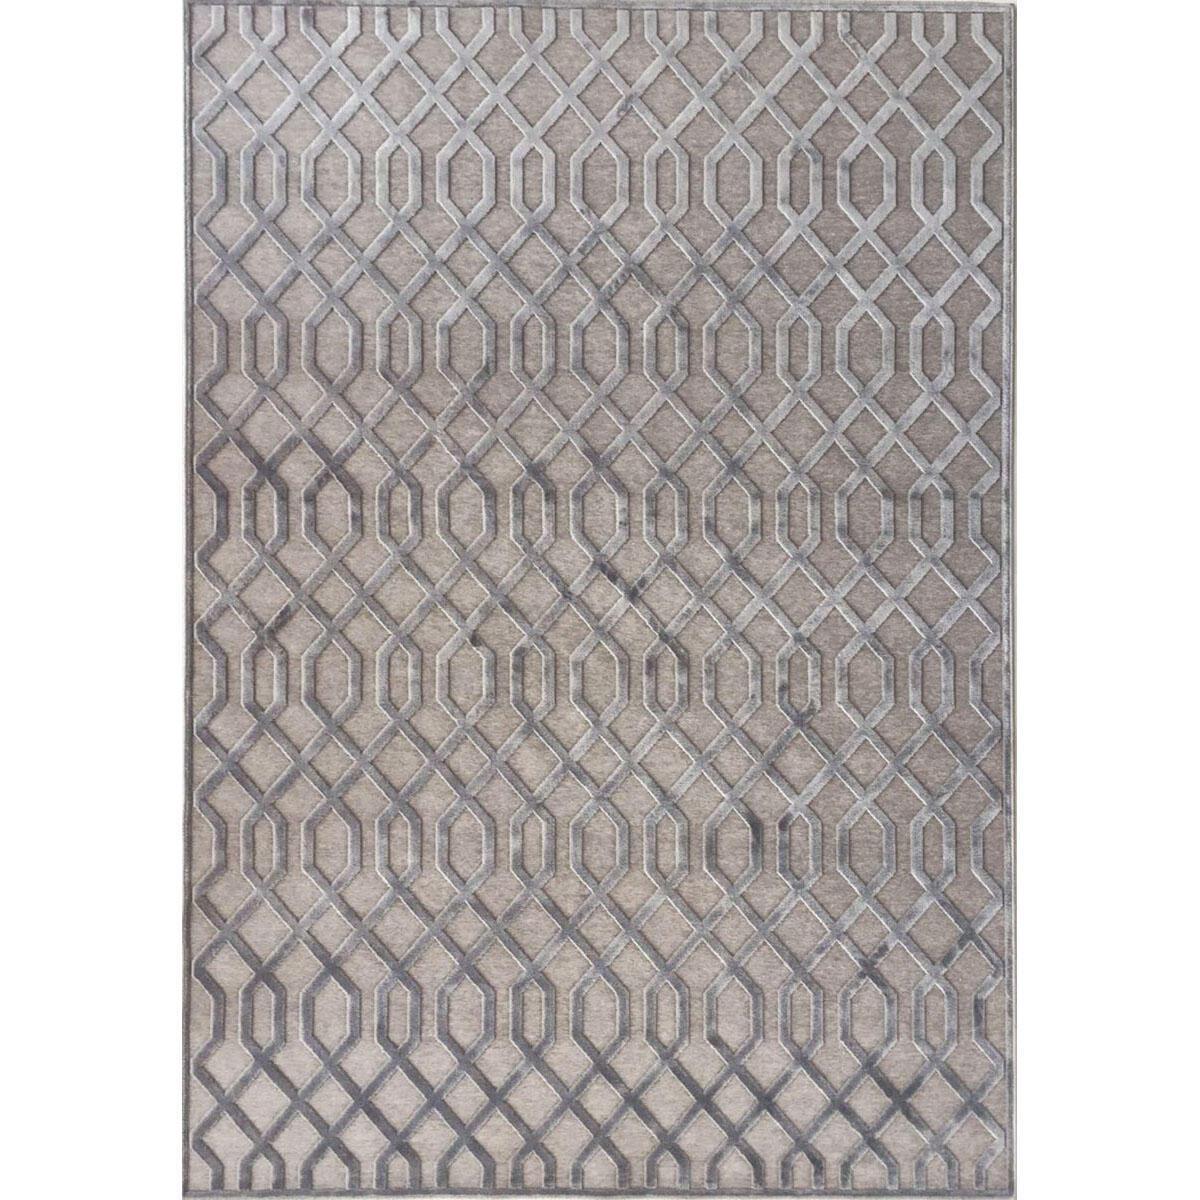 Tappeto farashe 2 , grigio, 140x200 - 4